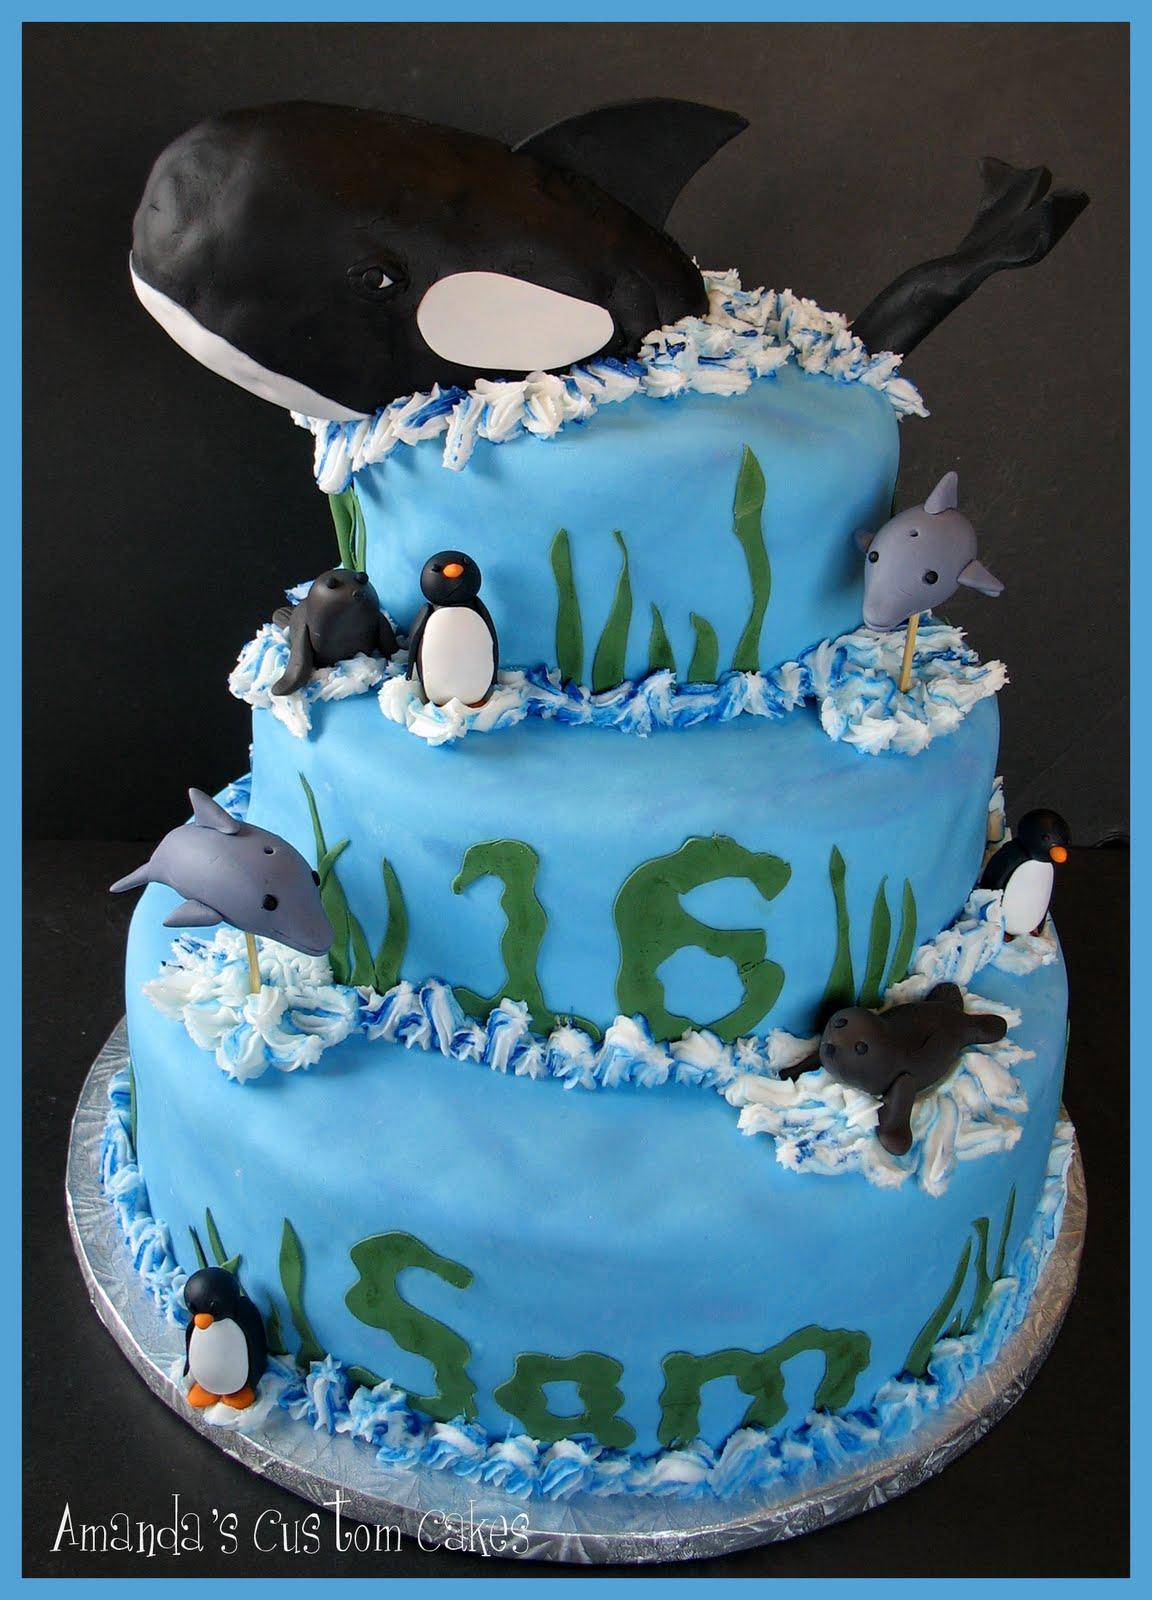 tiers are gluten free chocolate cake, bottom tier is vanilla cake ...